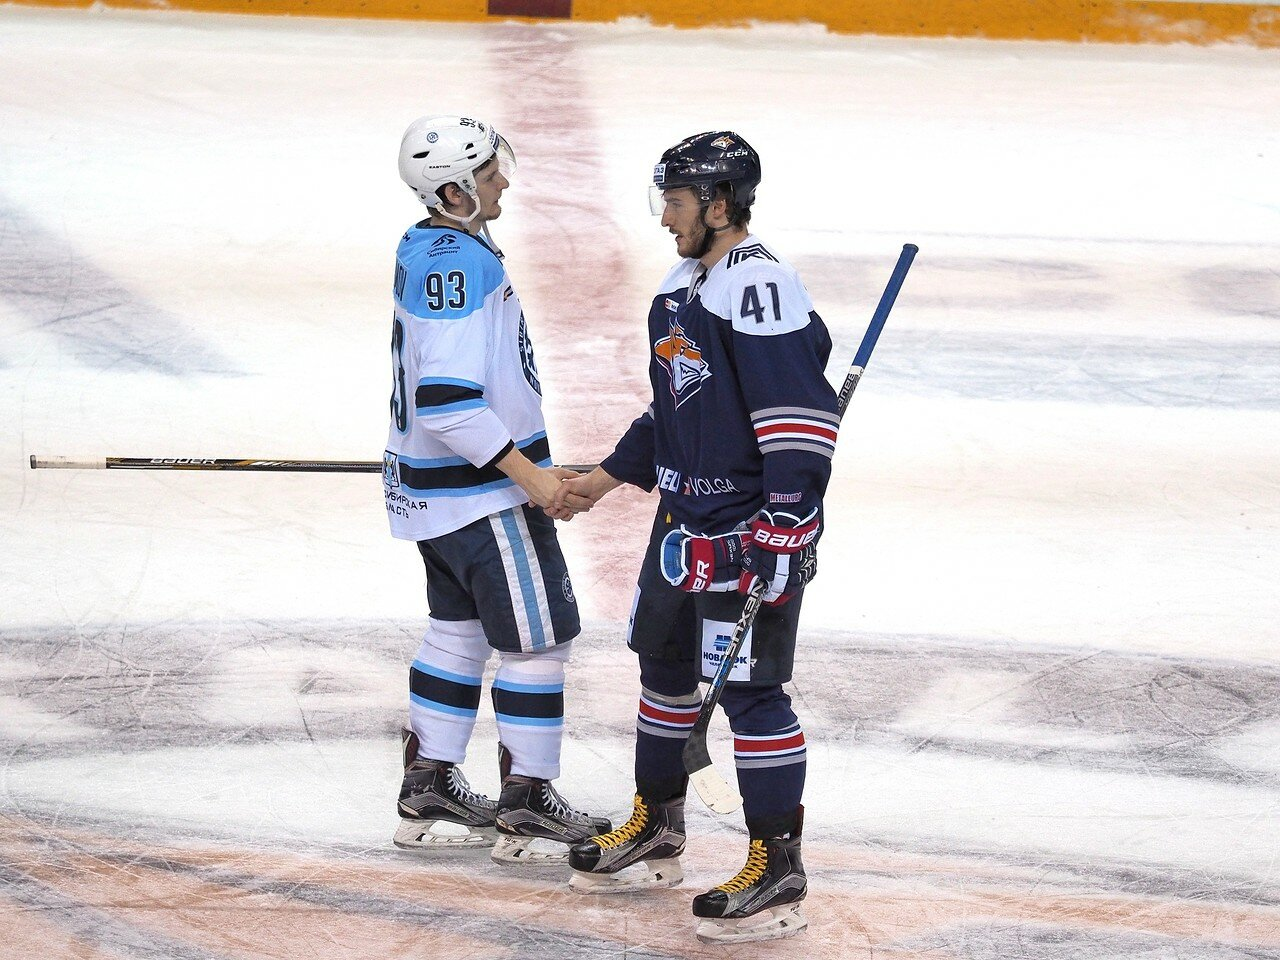 79Плей-офф 2016 Восток 1/2 Металлург - Сибирь 16.03.2016